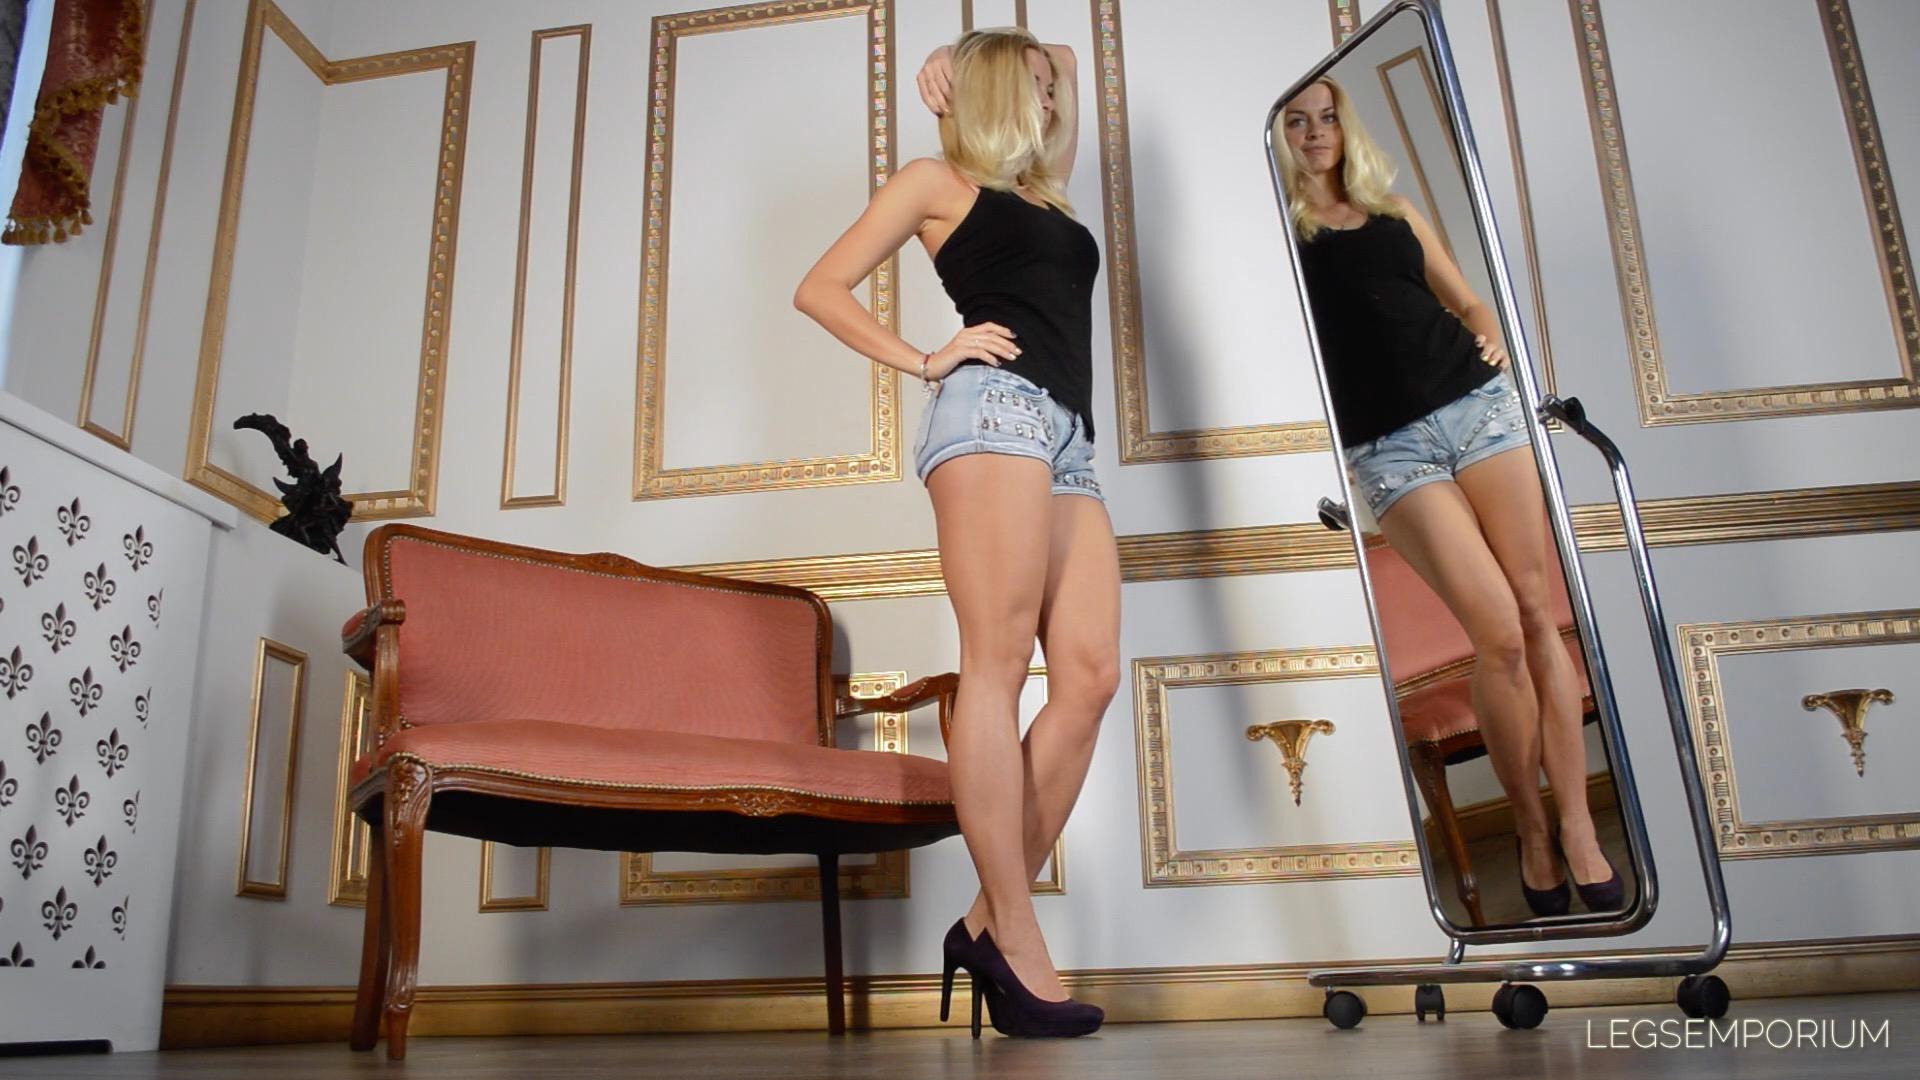 Sexy sissy pics-7409